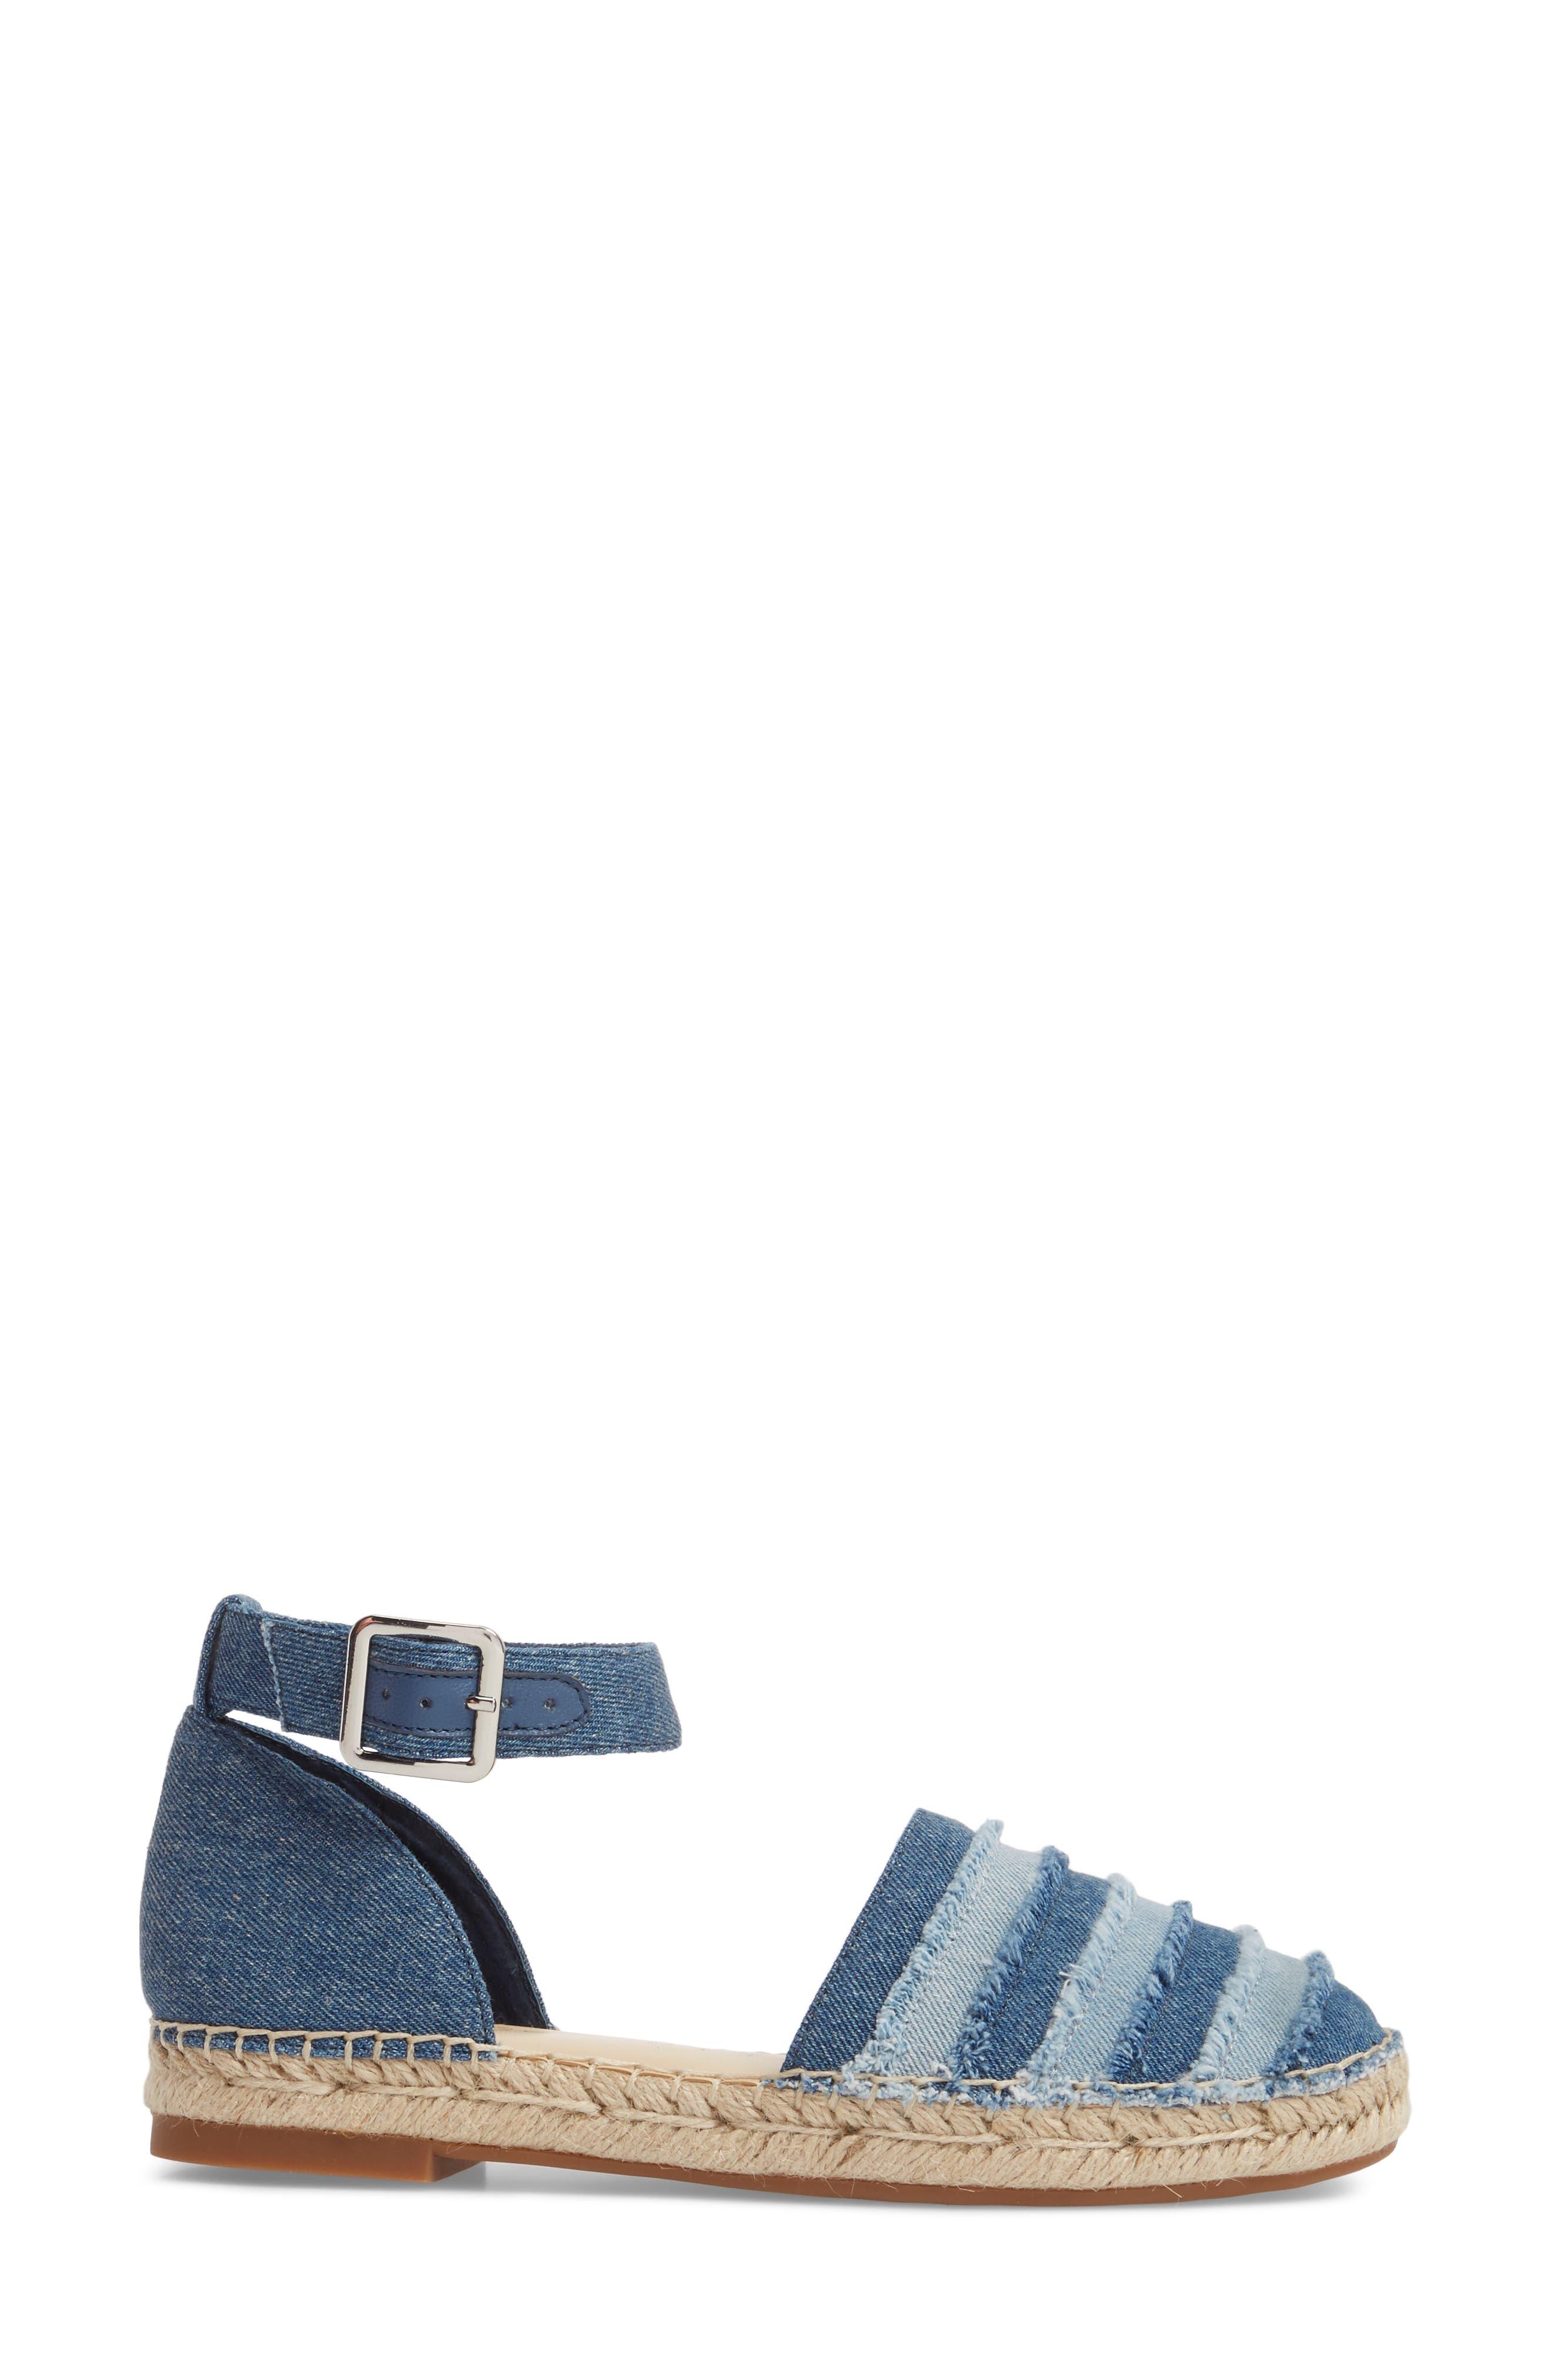 Stacie Espadrille Sandal,                             Alternate thumbnail 3, color,                             DARK BLUE